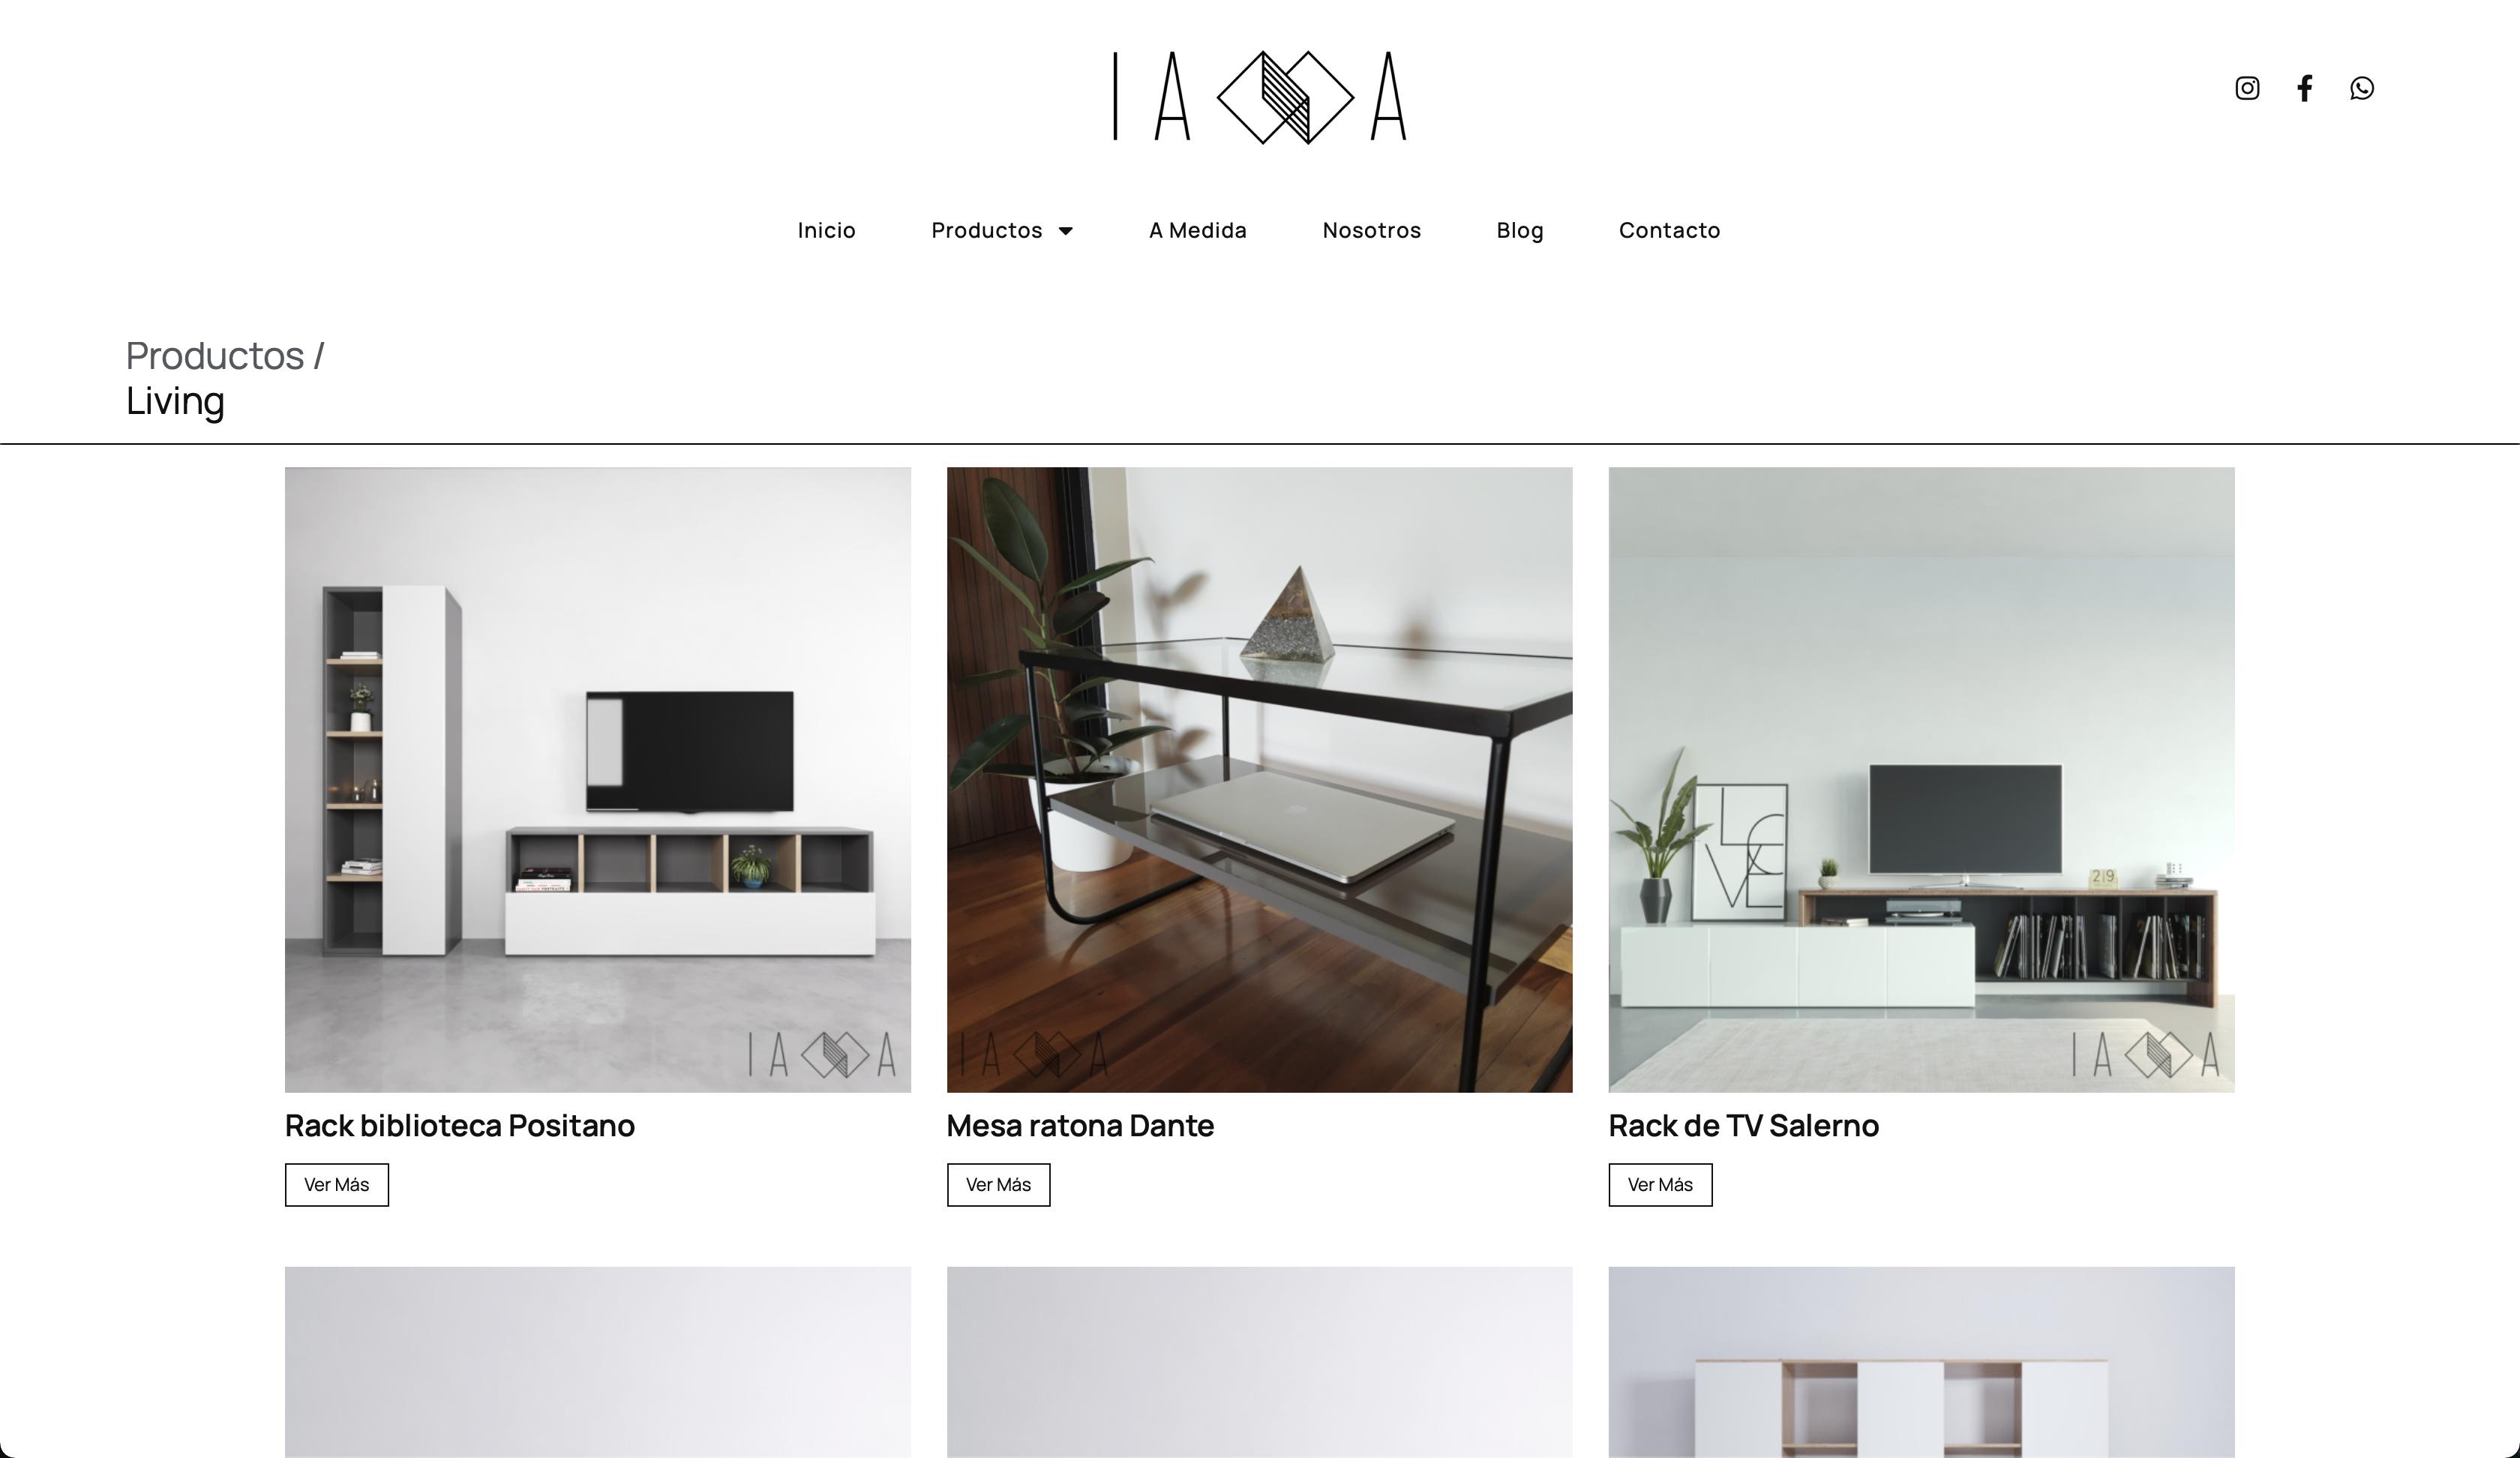 iana-muebles-online-lab-web-development-web-design-4